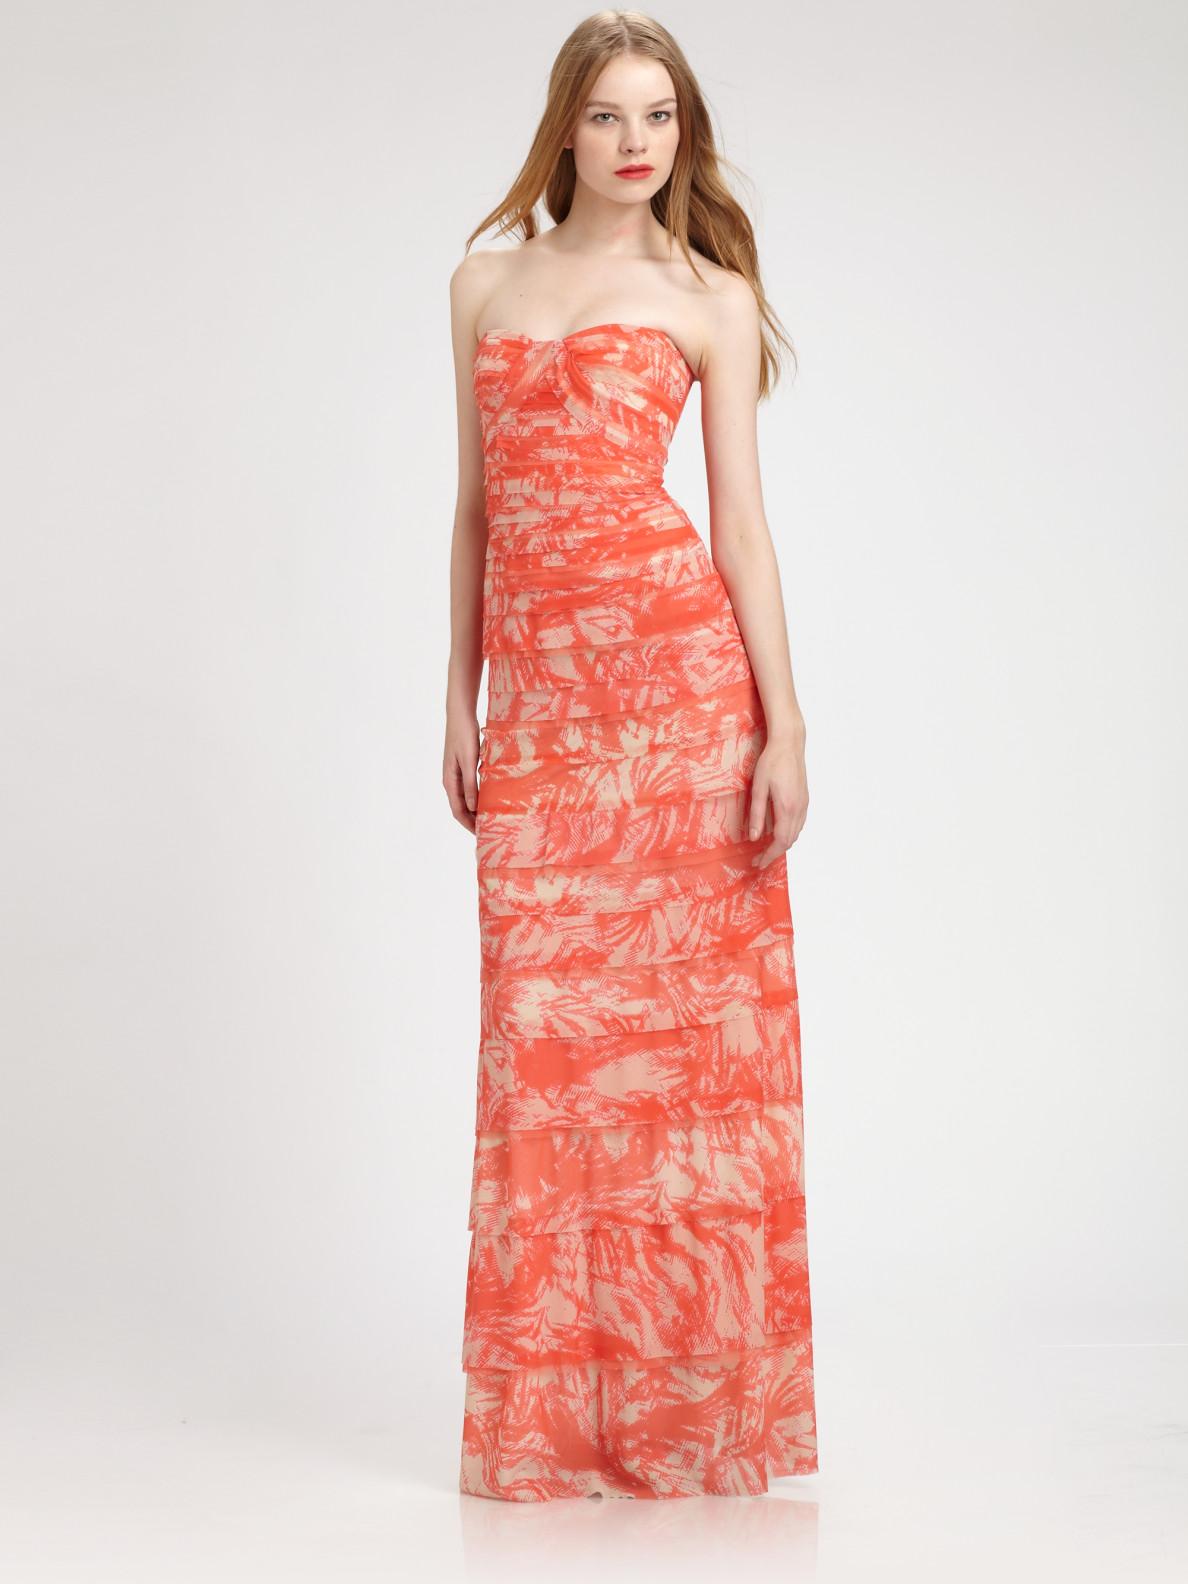 Lyst - BCBGMAXAZRIA Strapless Erika Gown in Orange 7f3f5e13f